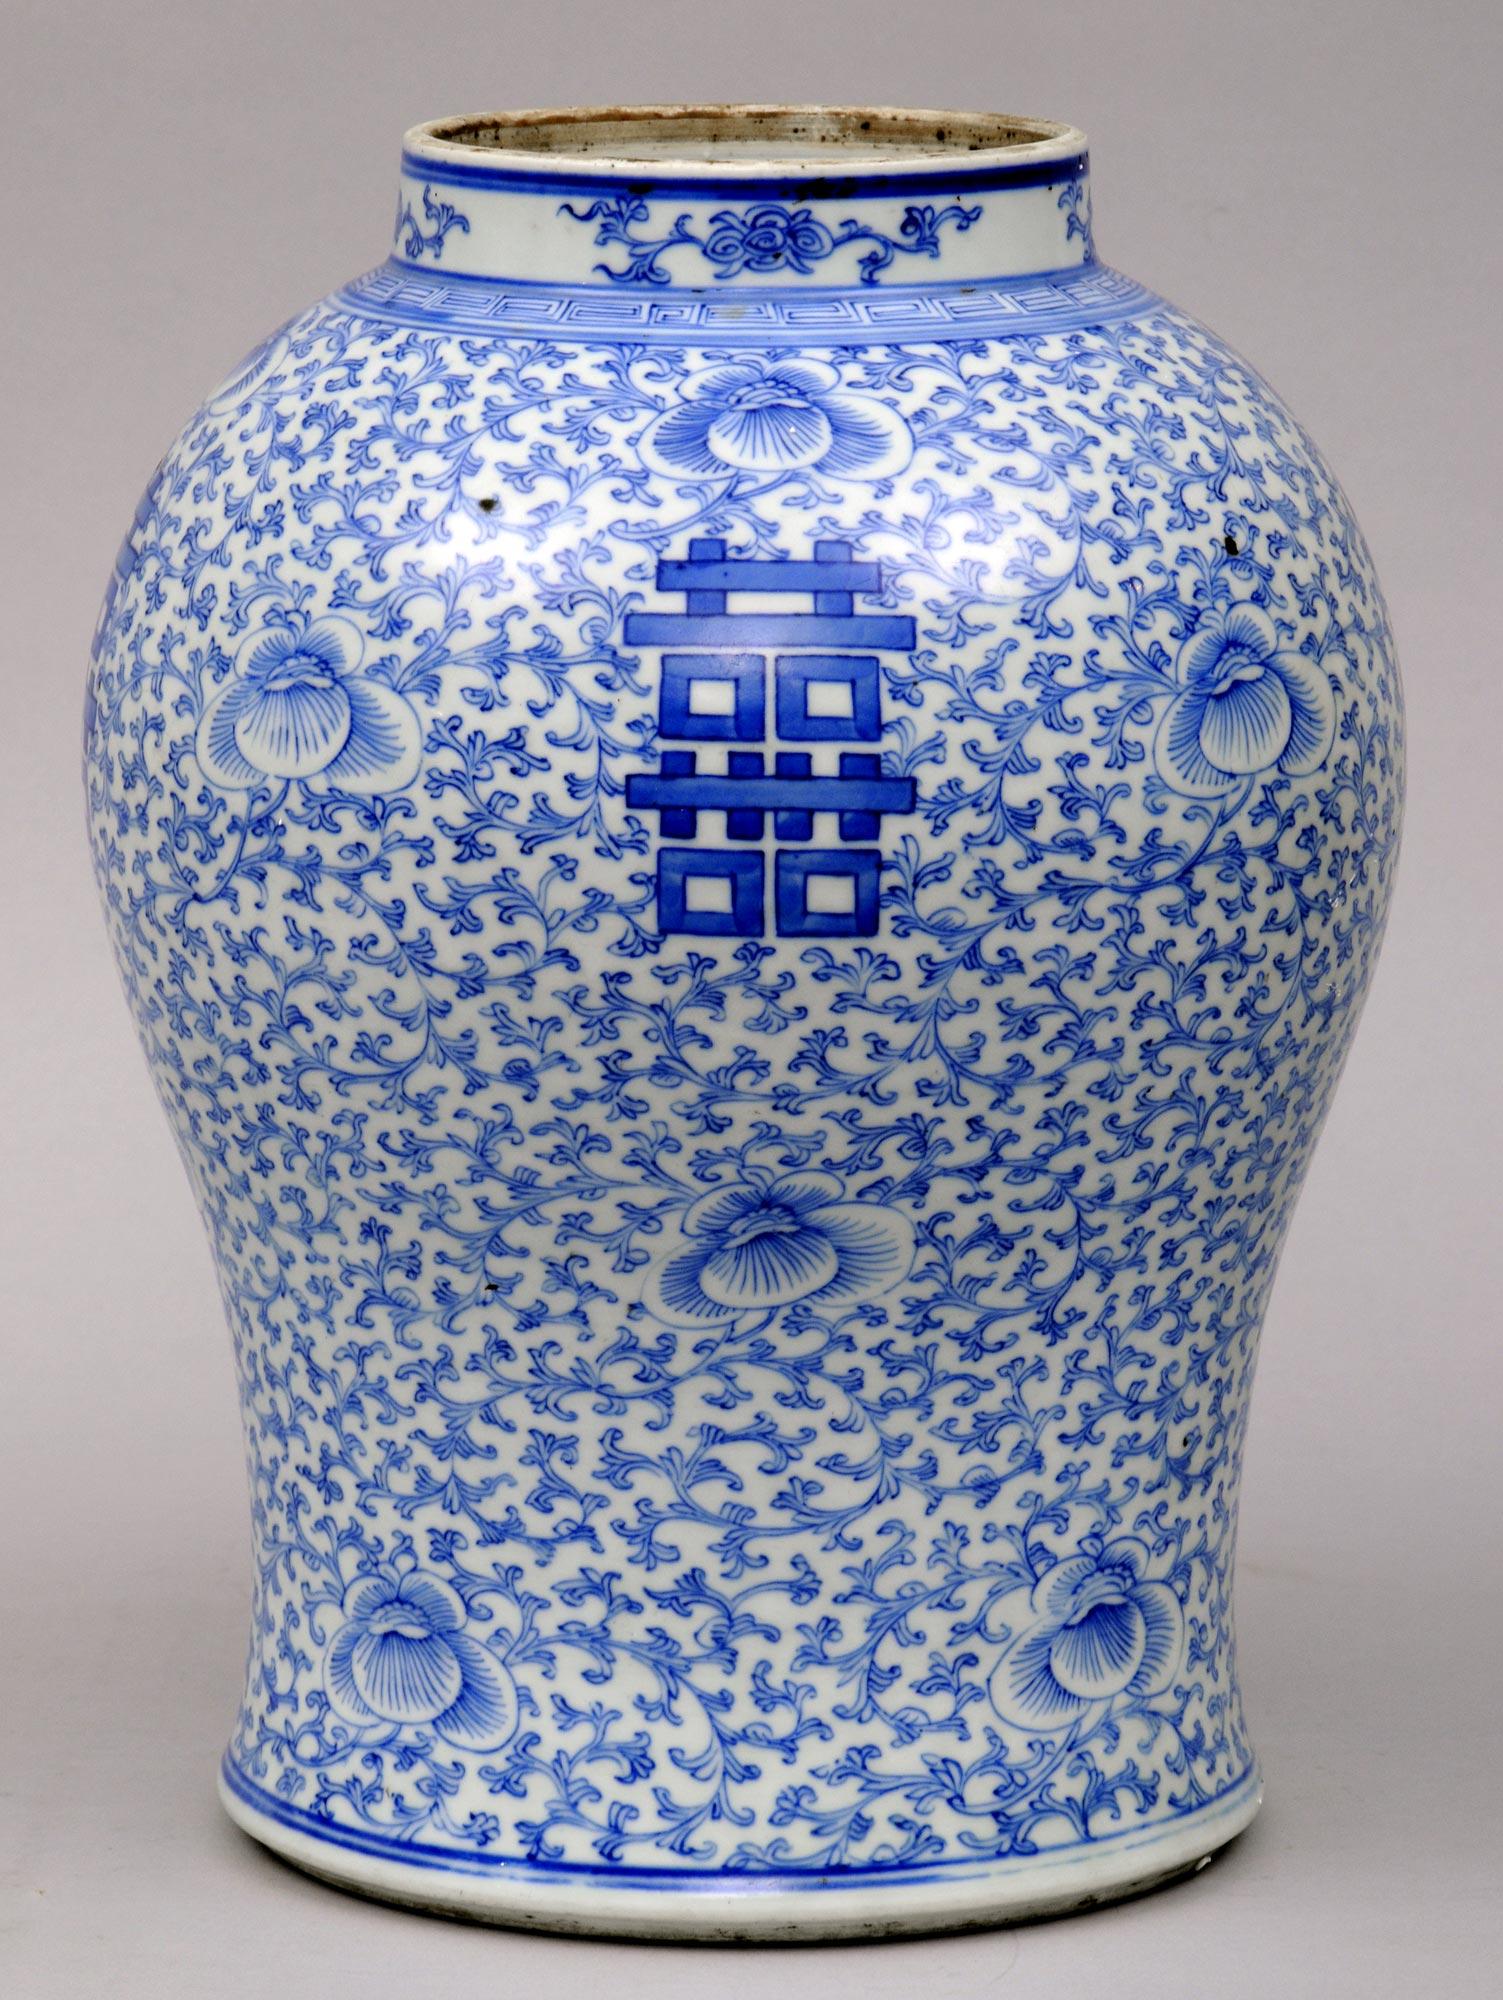 Antique Chinese Porcelain Lidded Vase Circa 1800